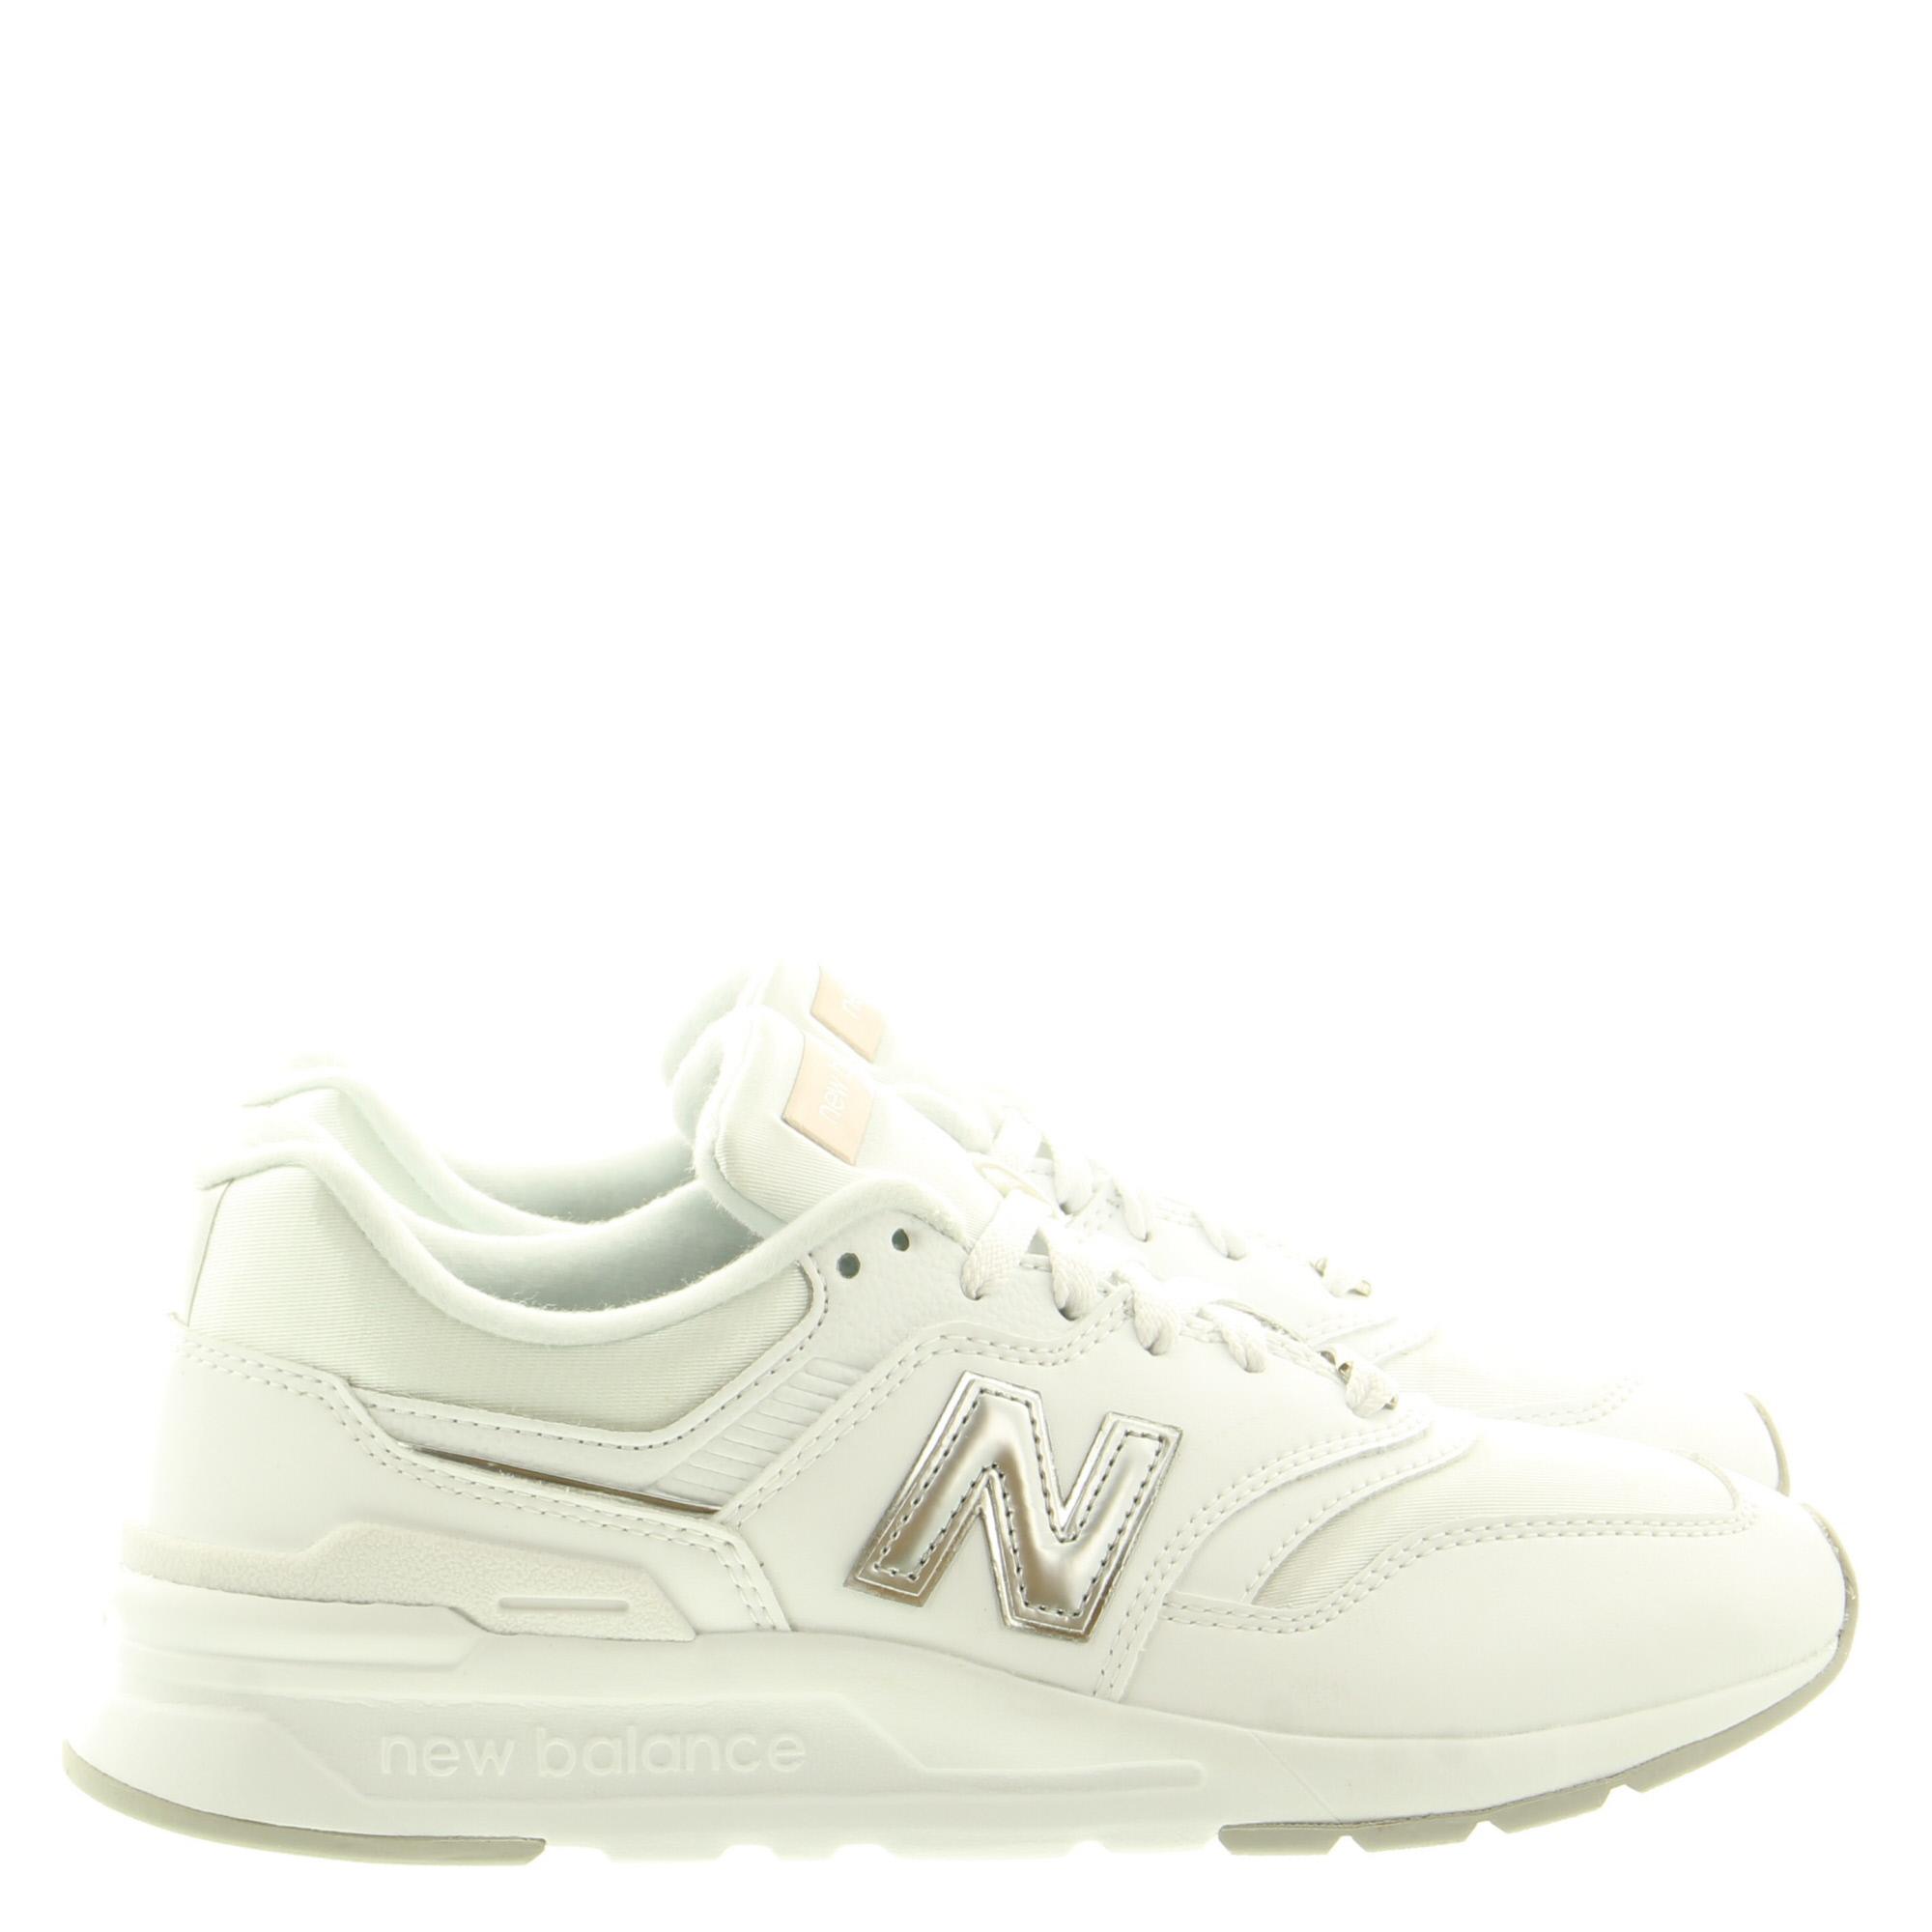 New Balance CW997HMV 100 White